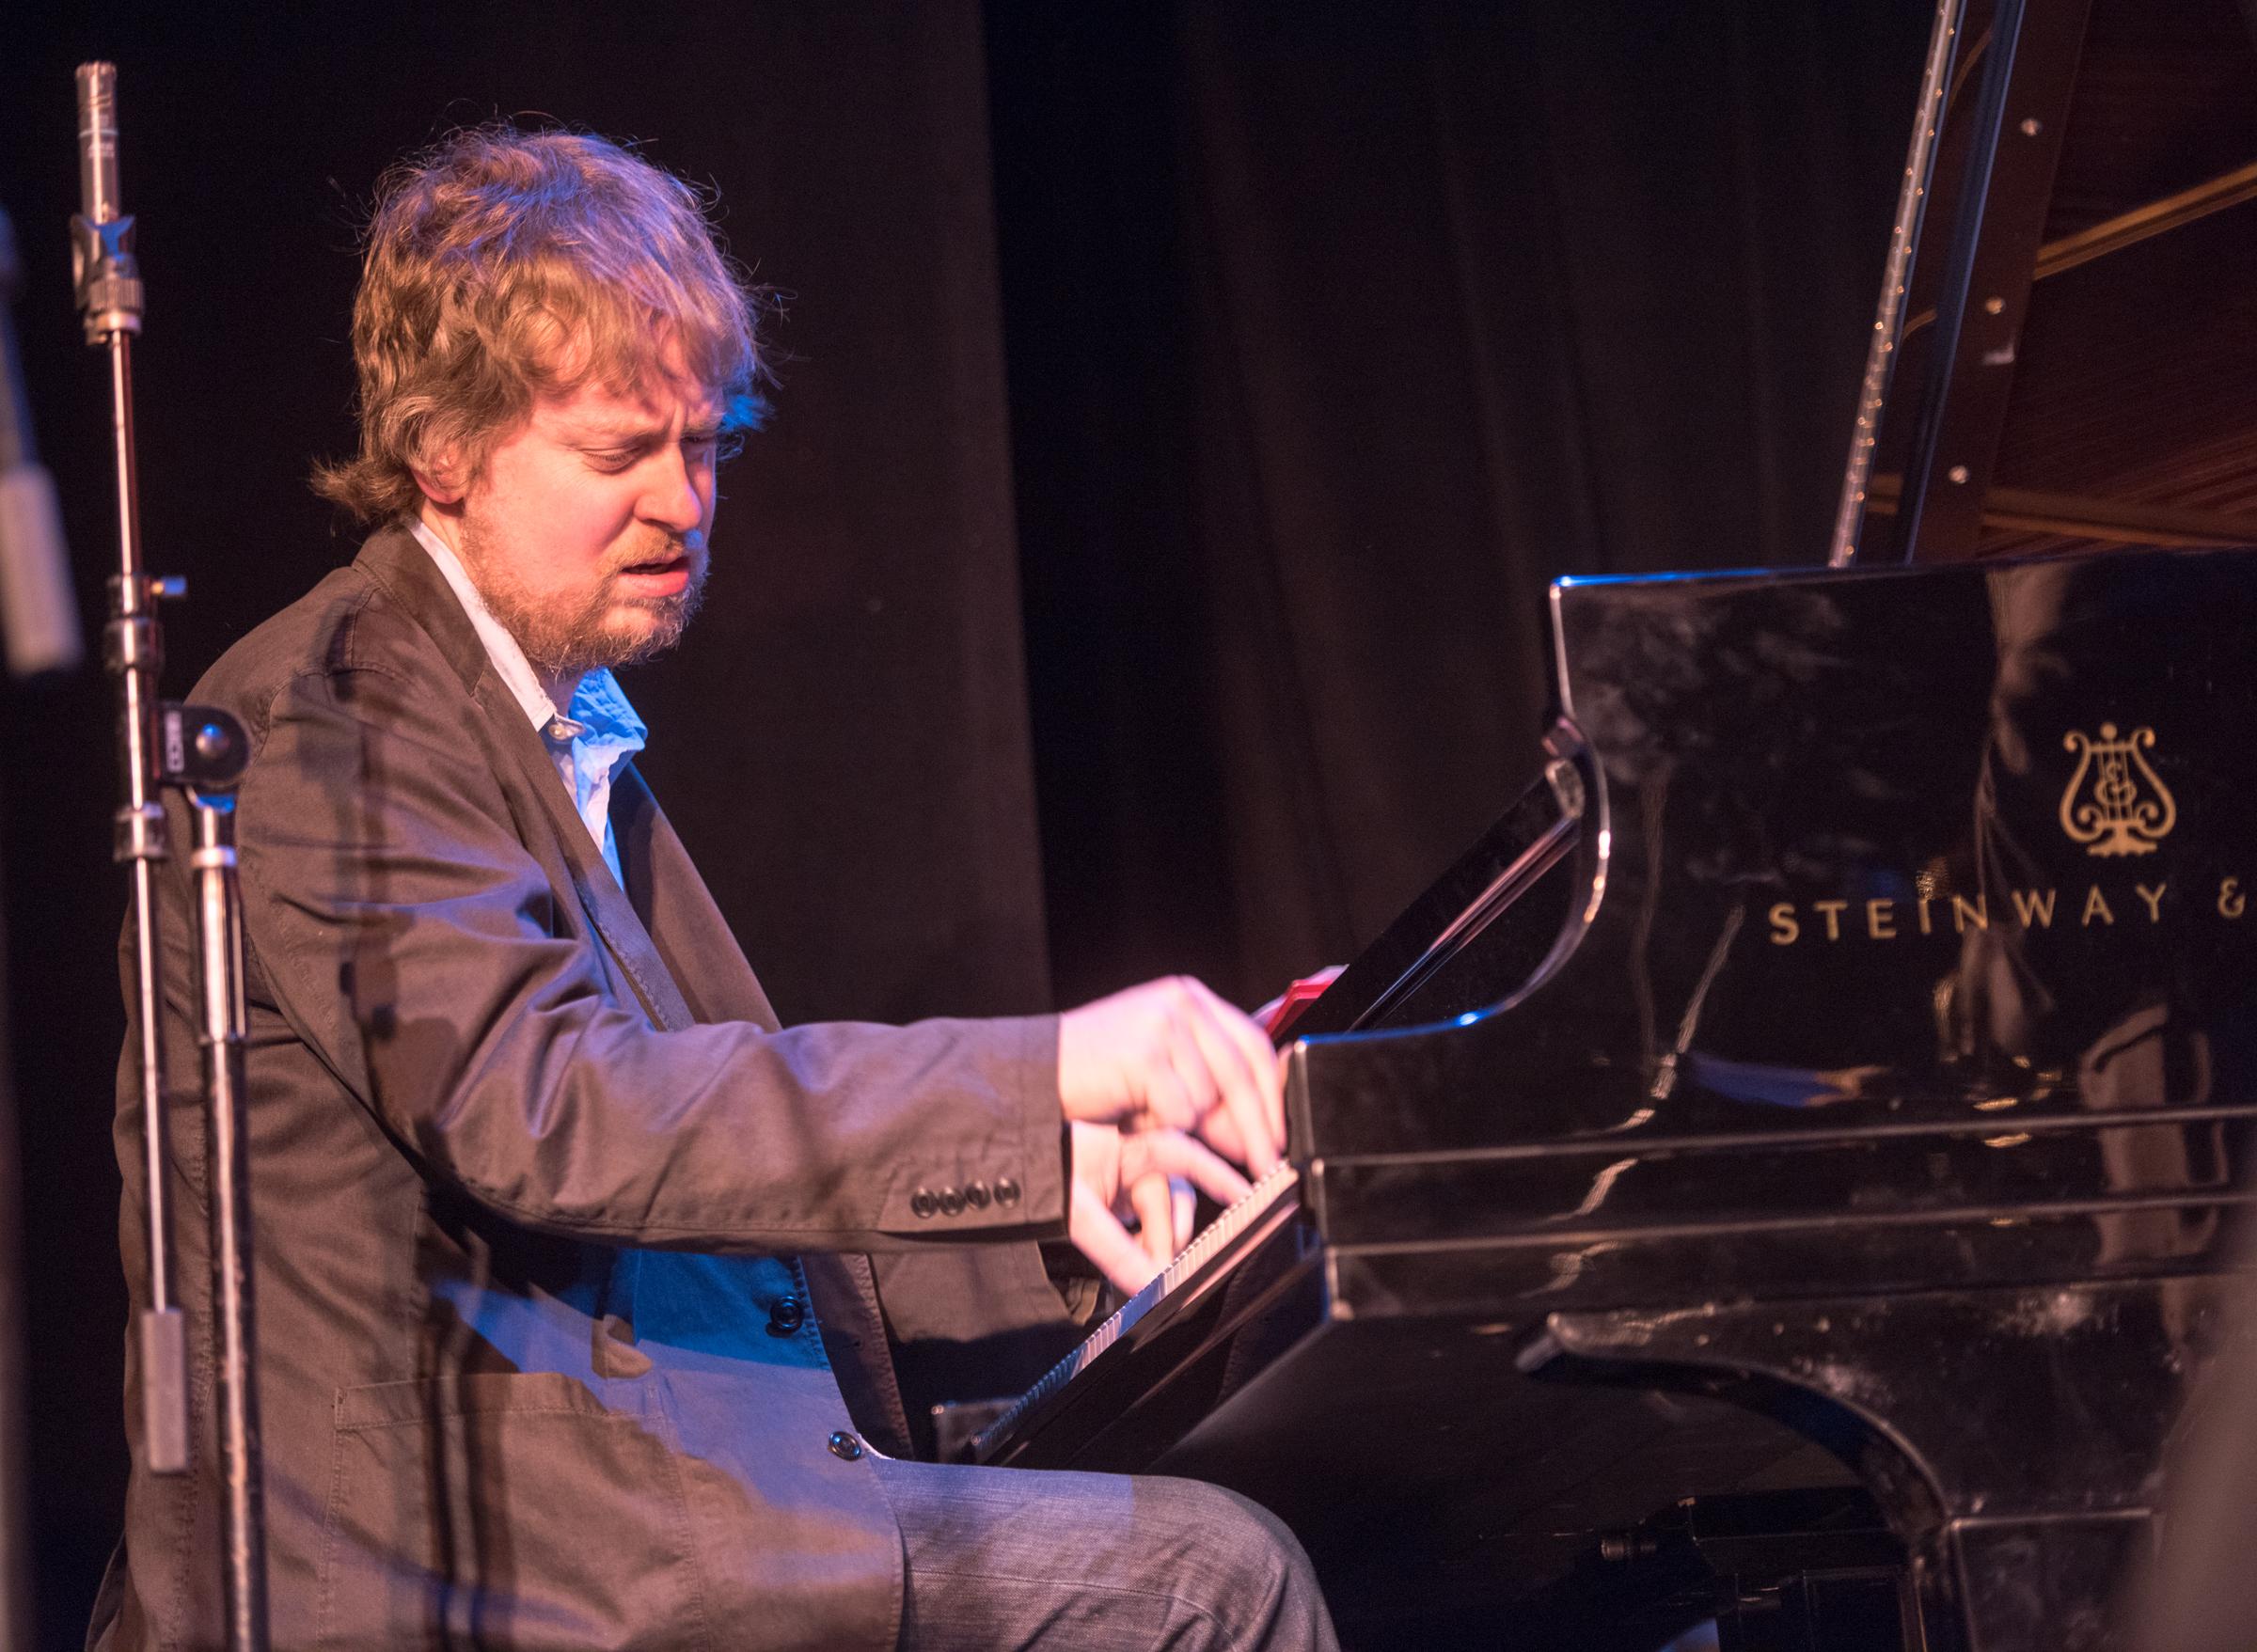 Matt Mitchell with the Darius Jones Quartet at the Nyc Winter Jazzfest 2015